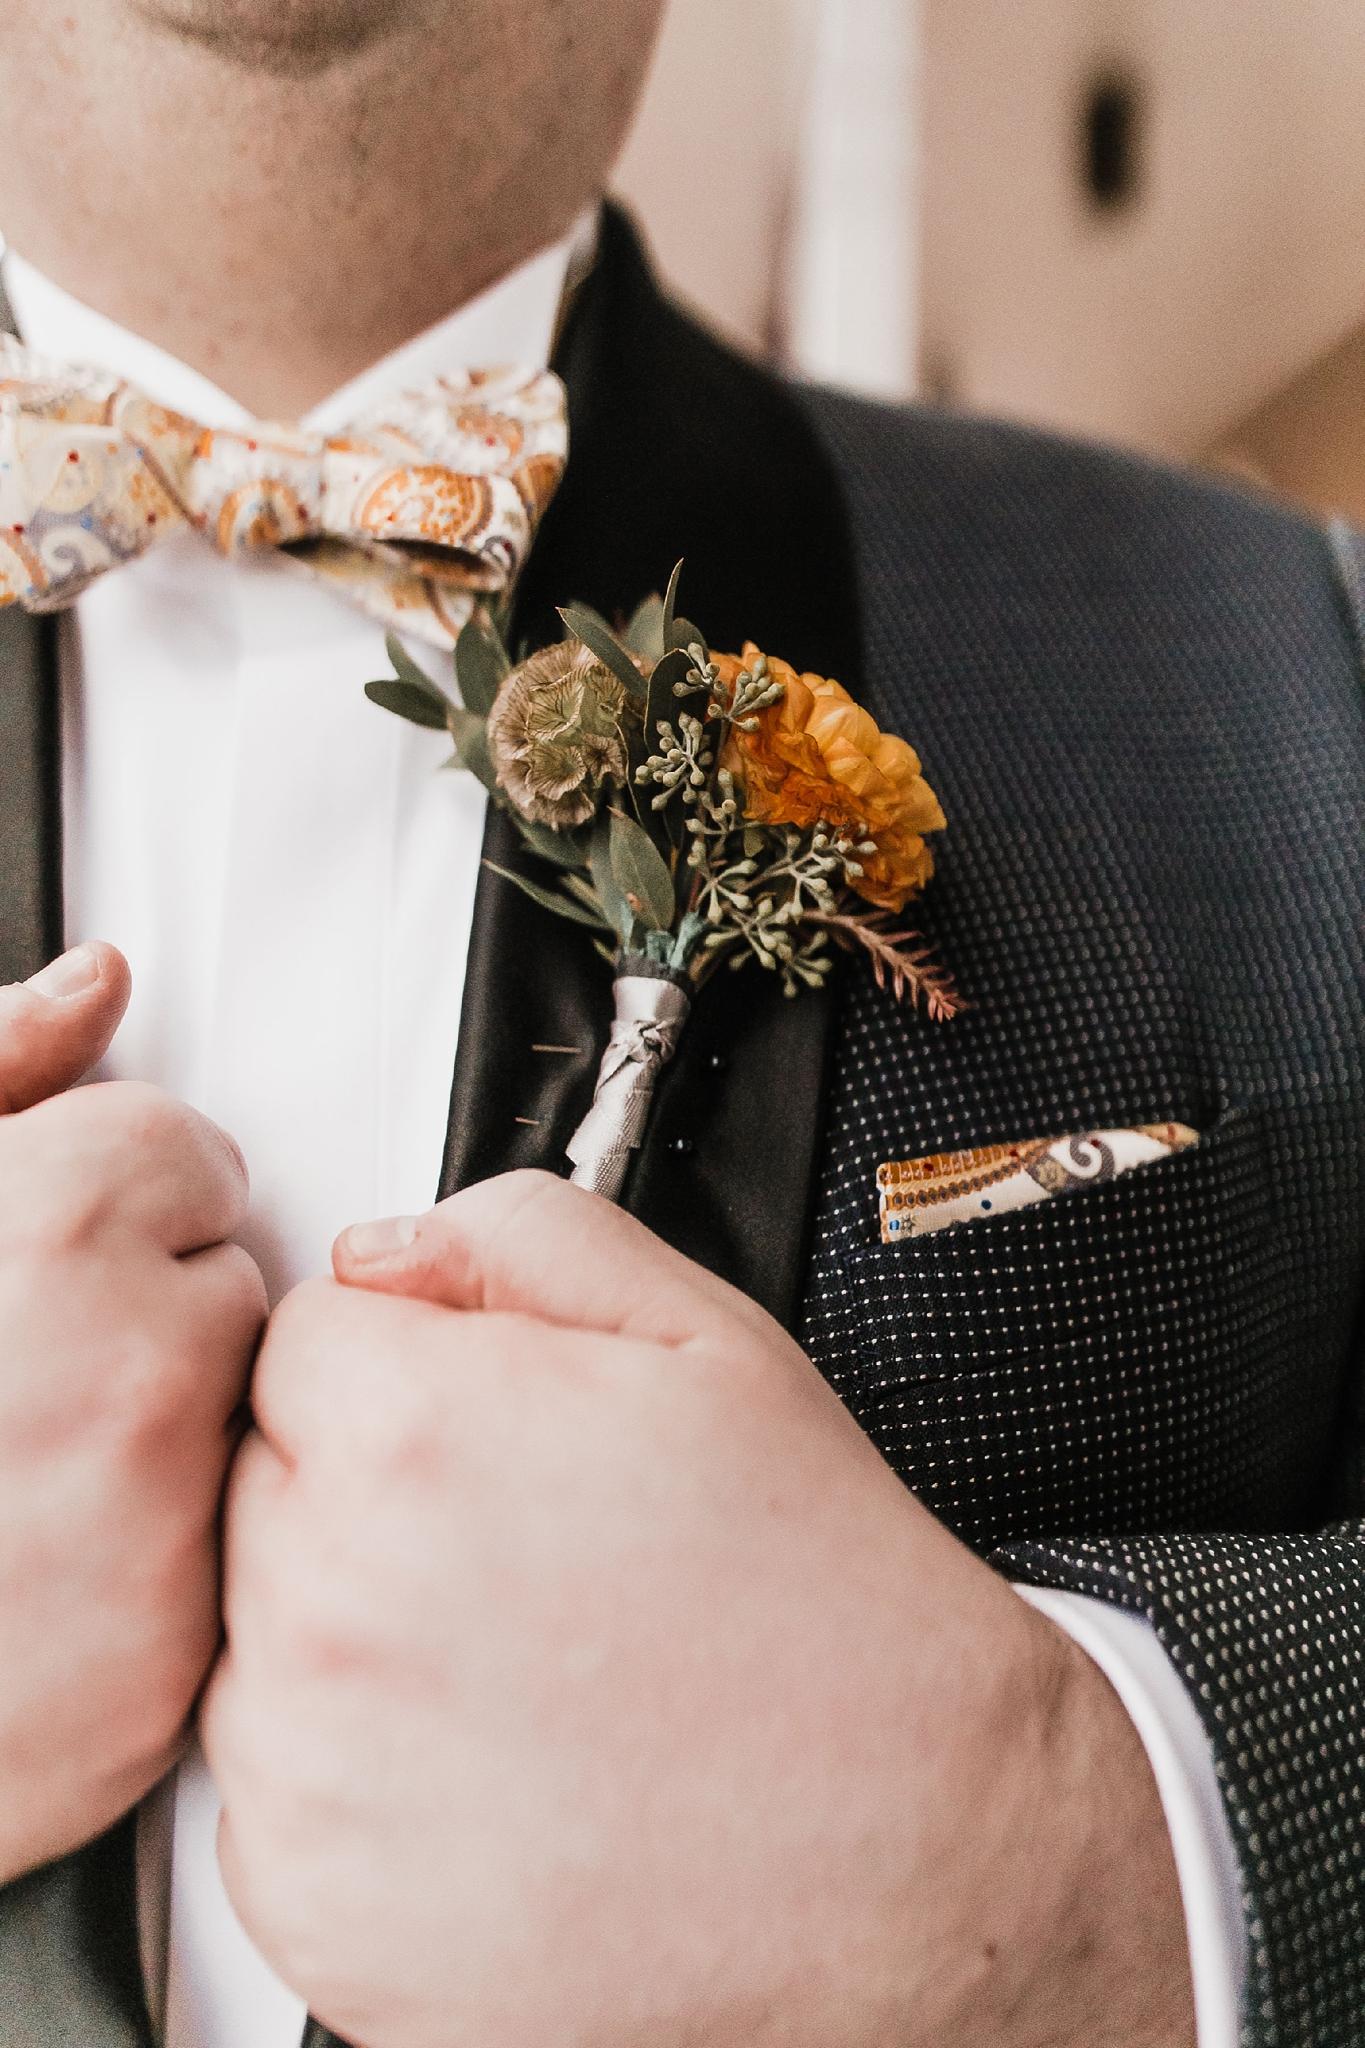 Alicia+lucia+photography+-+albuquerque+wedding+photographer+-+santa+fe+wedding+photography+-+new+mexico+wedding+photographer+-+new+mexico+wedding+-+wedding+-+groom+-+groom+style+-+wedding+style_0064.jpg